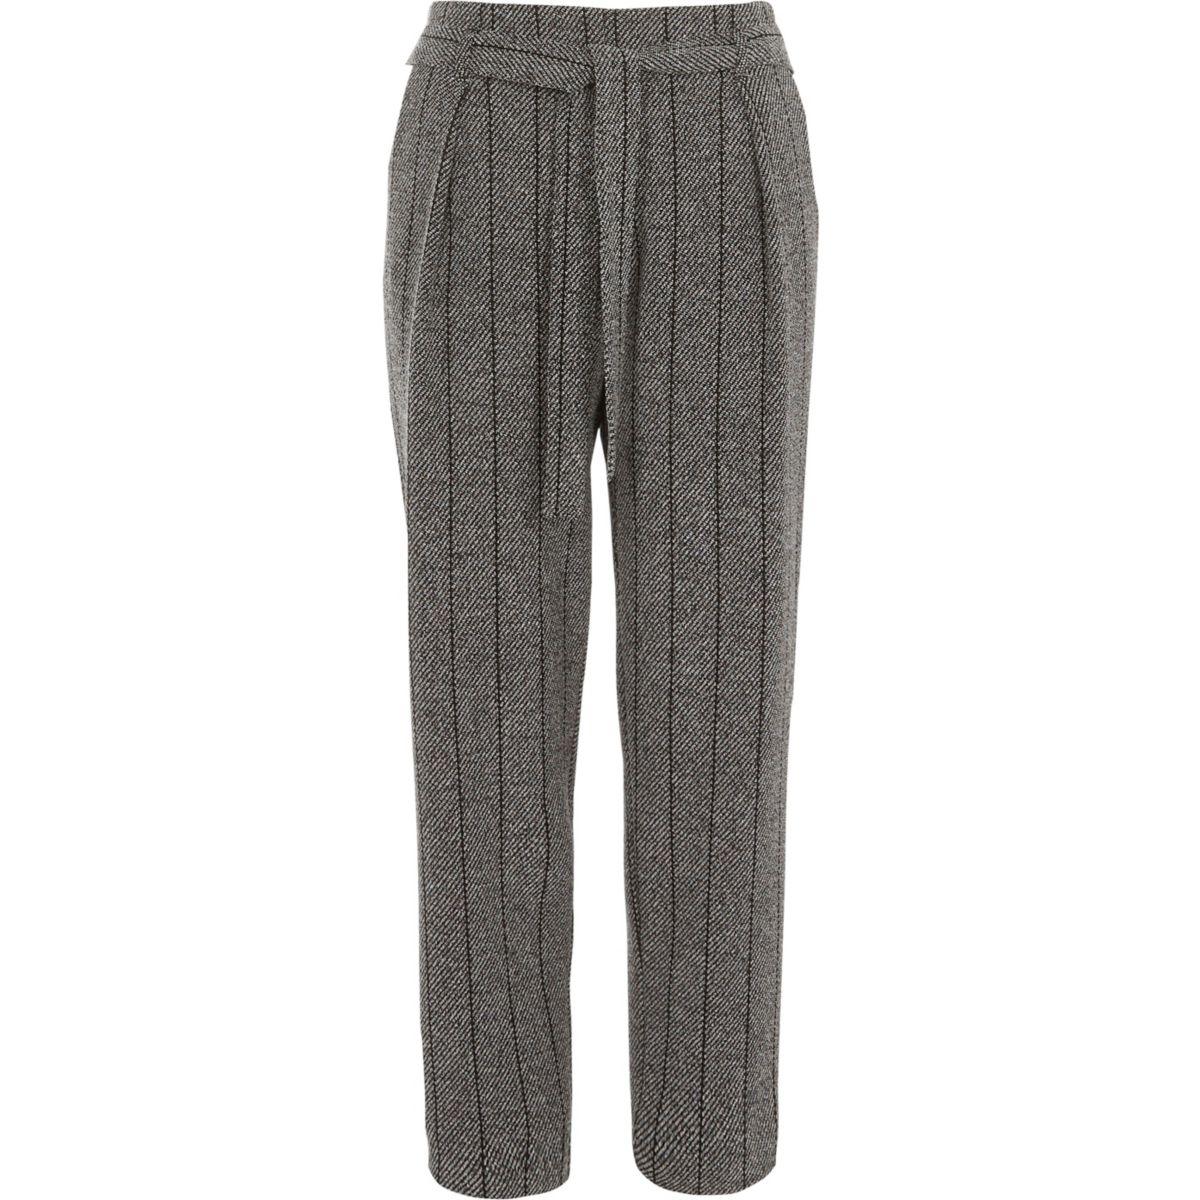 Grey herringbone check tapered trousers